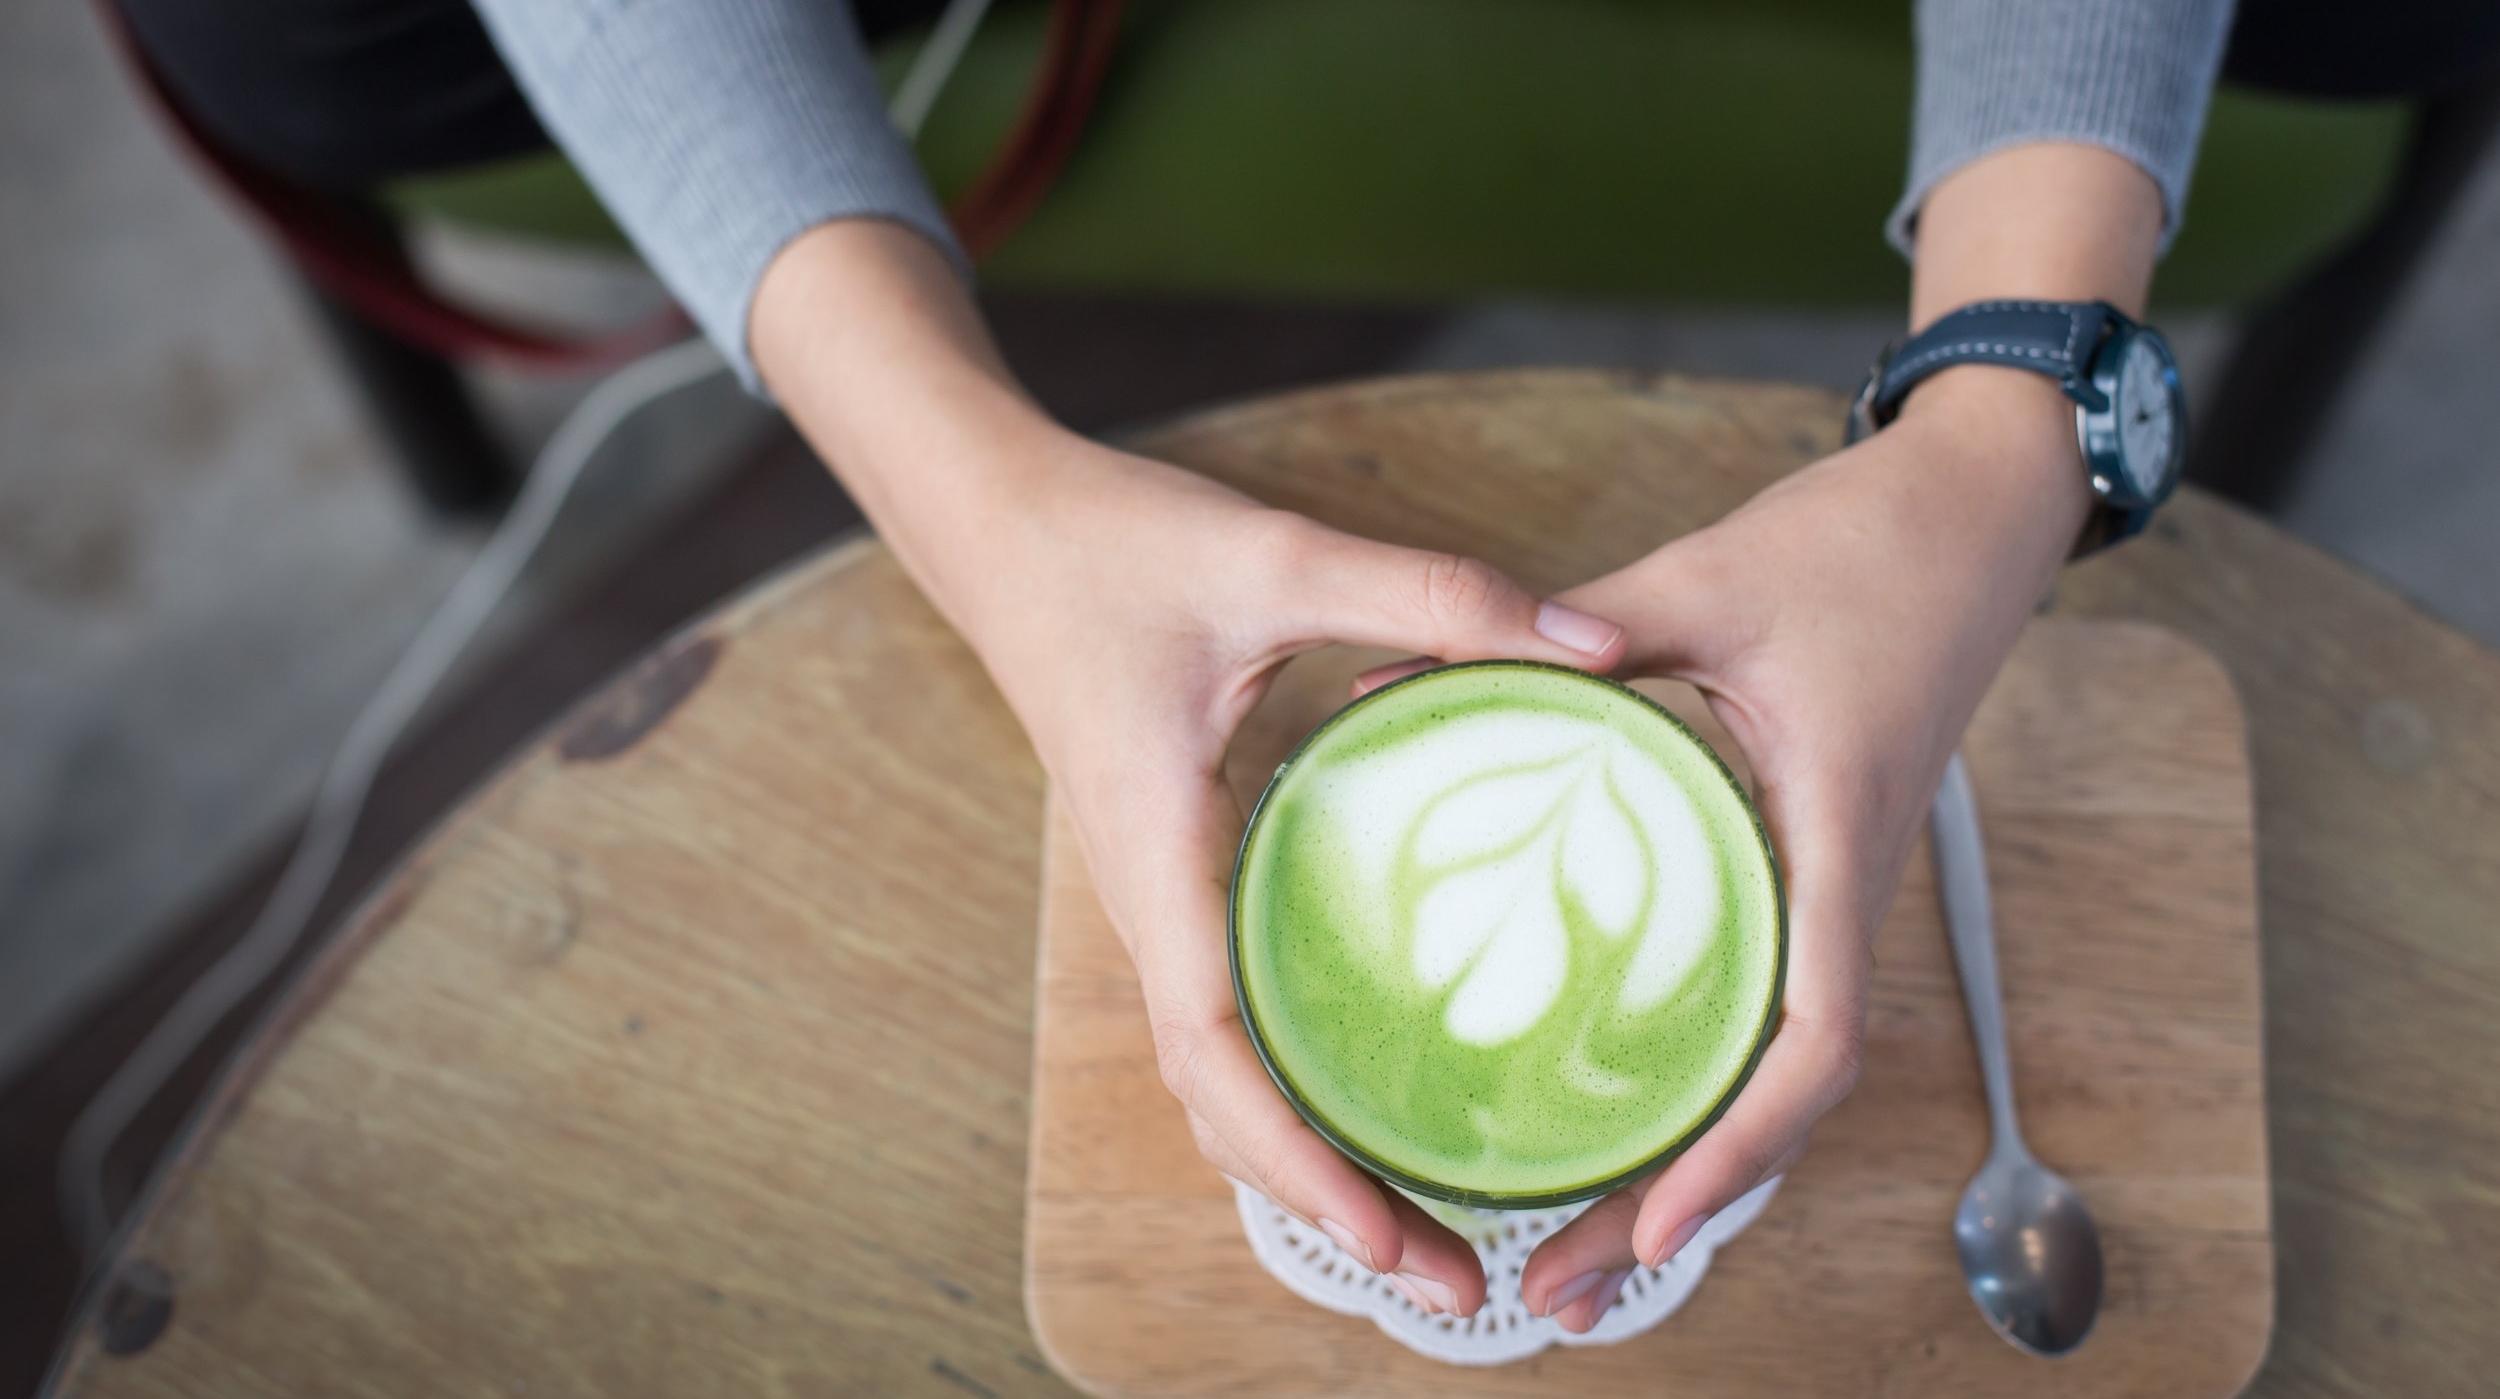 A distinctively green matcha latte